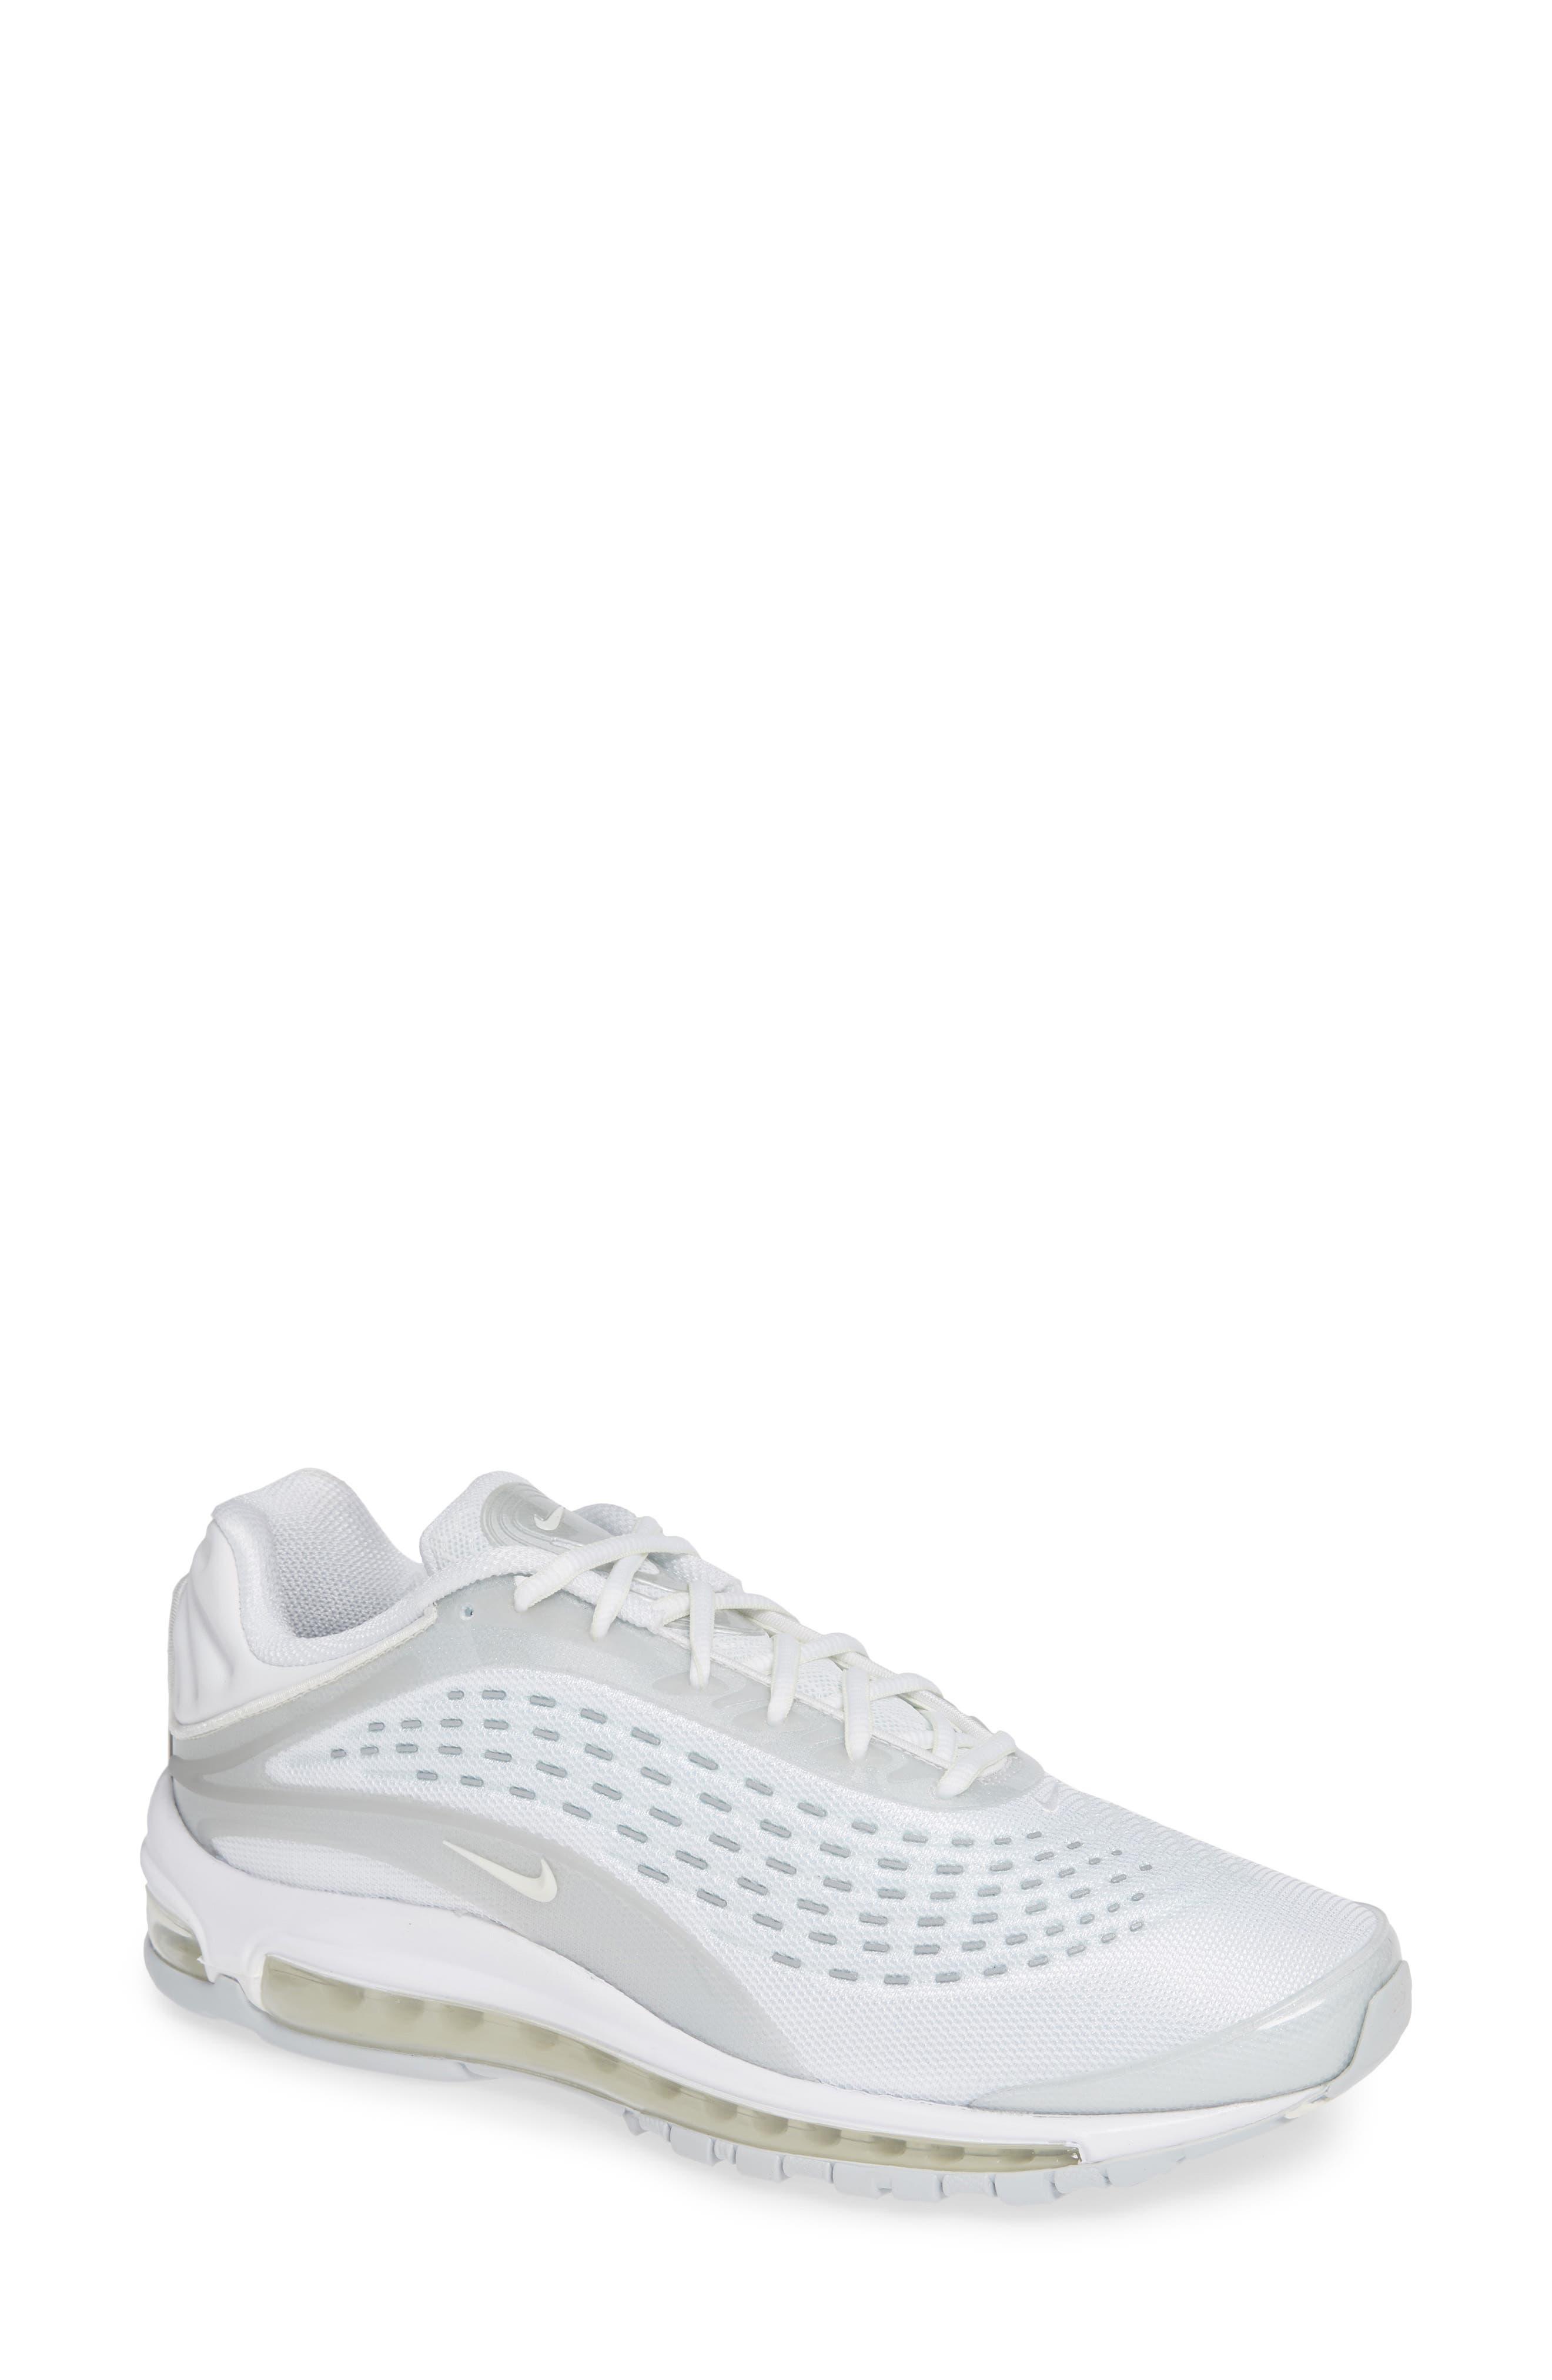 NIKE Air Max Deluxe Sneaker, Main, color, WHITE/ SAIL/ PURE PLATINUM